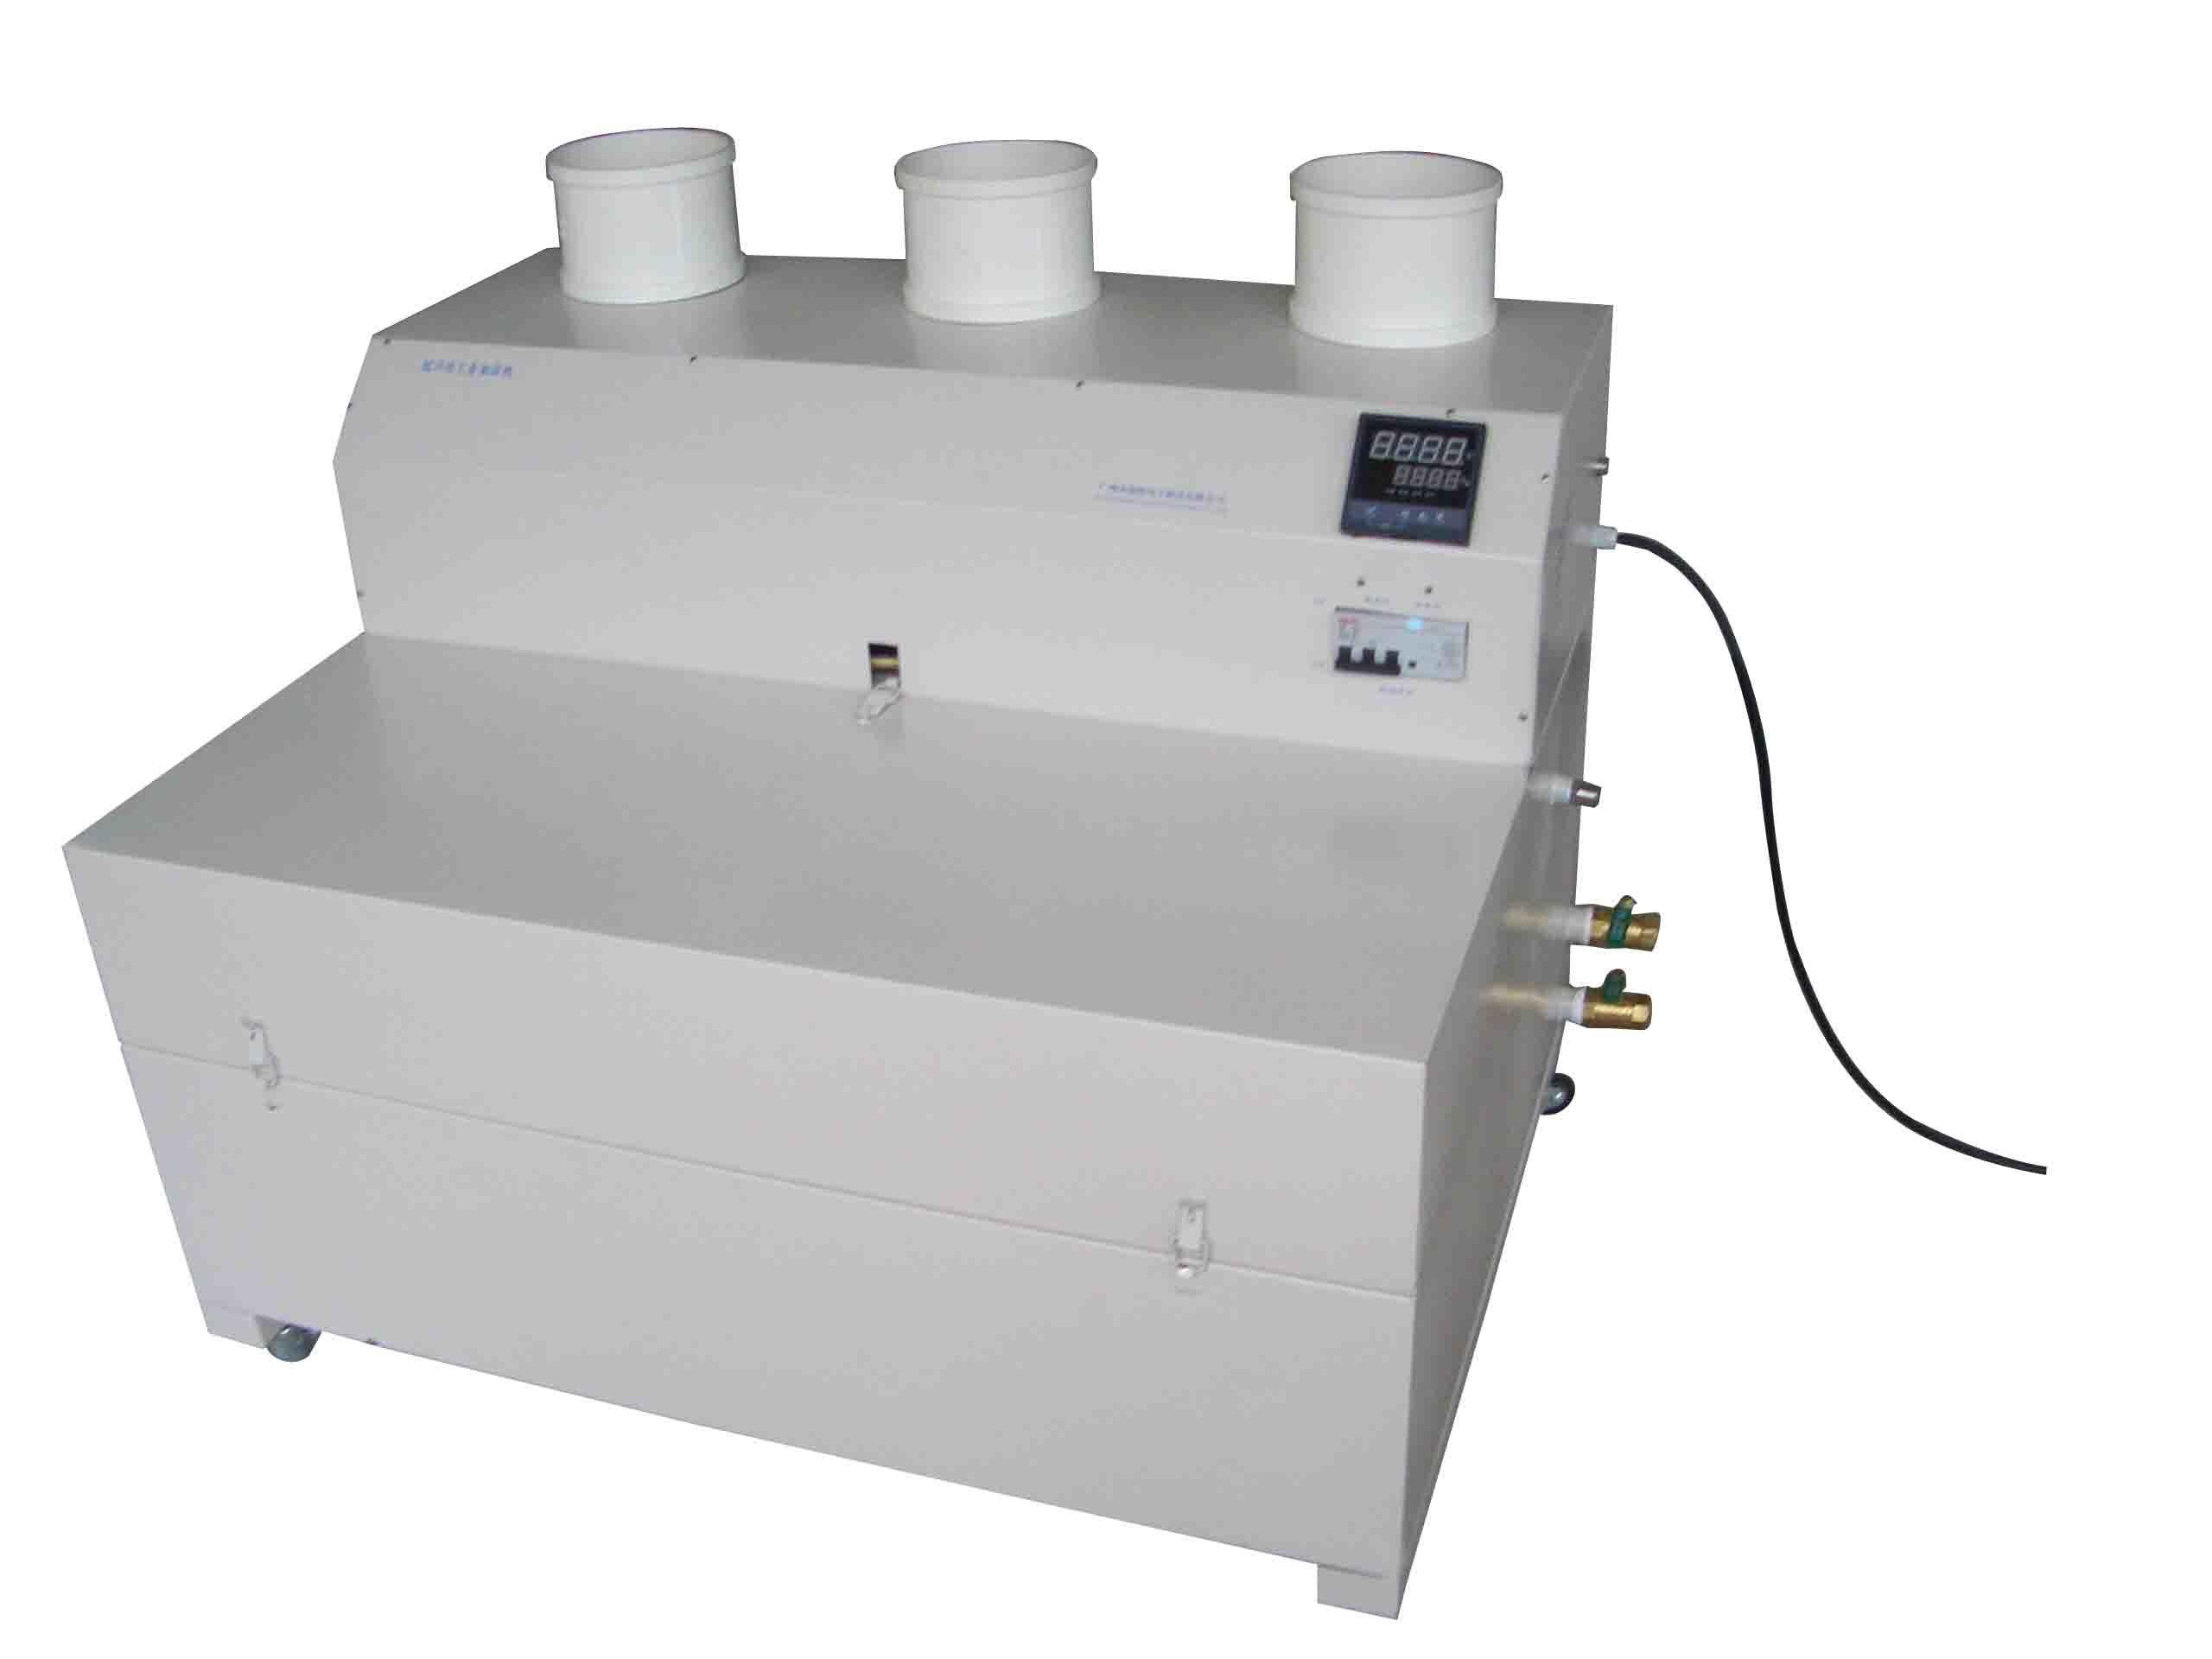 Humidifier (AOTE JS045A) China Humidifier Industrial Humidifier #505B67